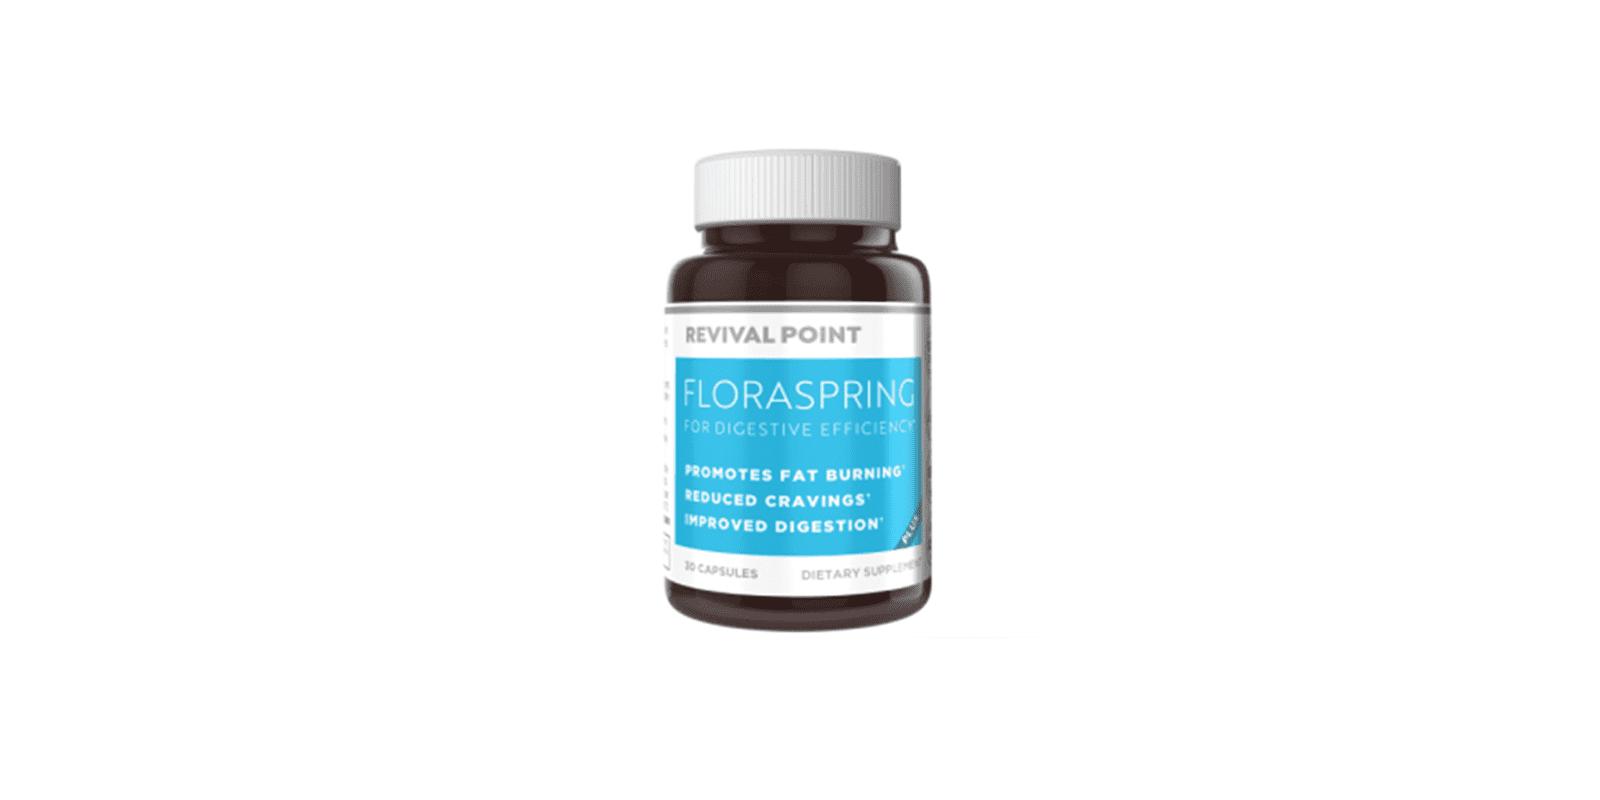 Floraspring reviews